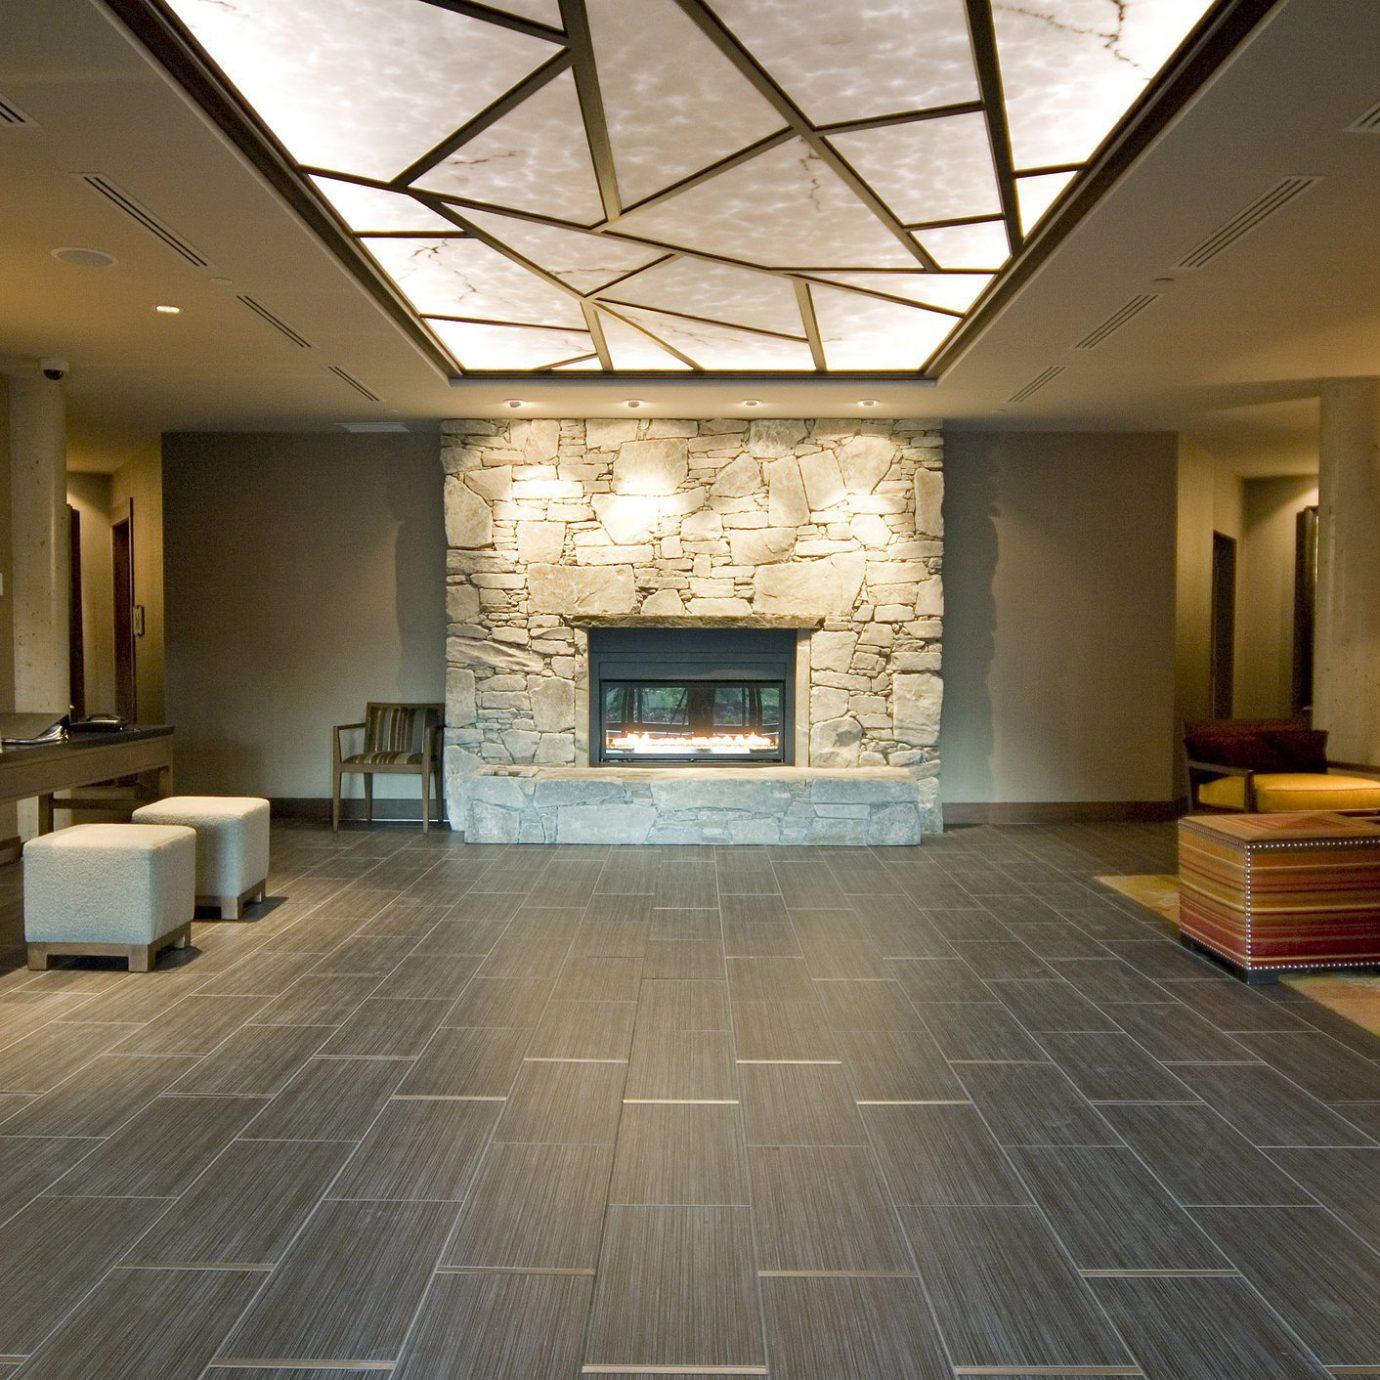 Fireplace Lobby Lodge Lounge Modern Mountains property building living room flooring hardwood wood flooring home lighting stone Island